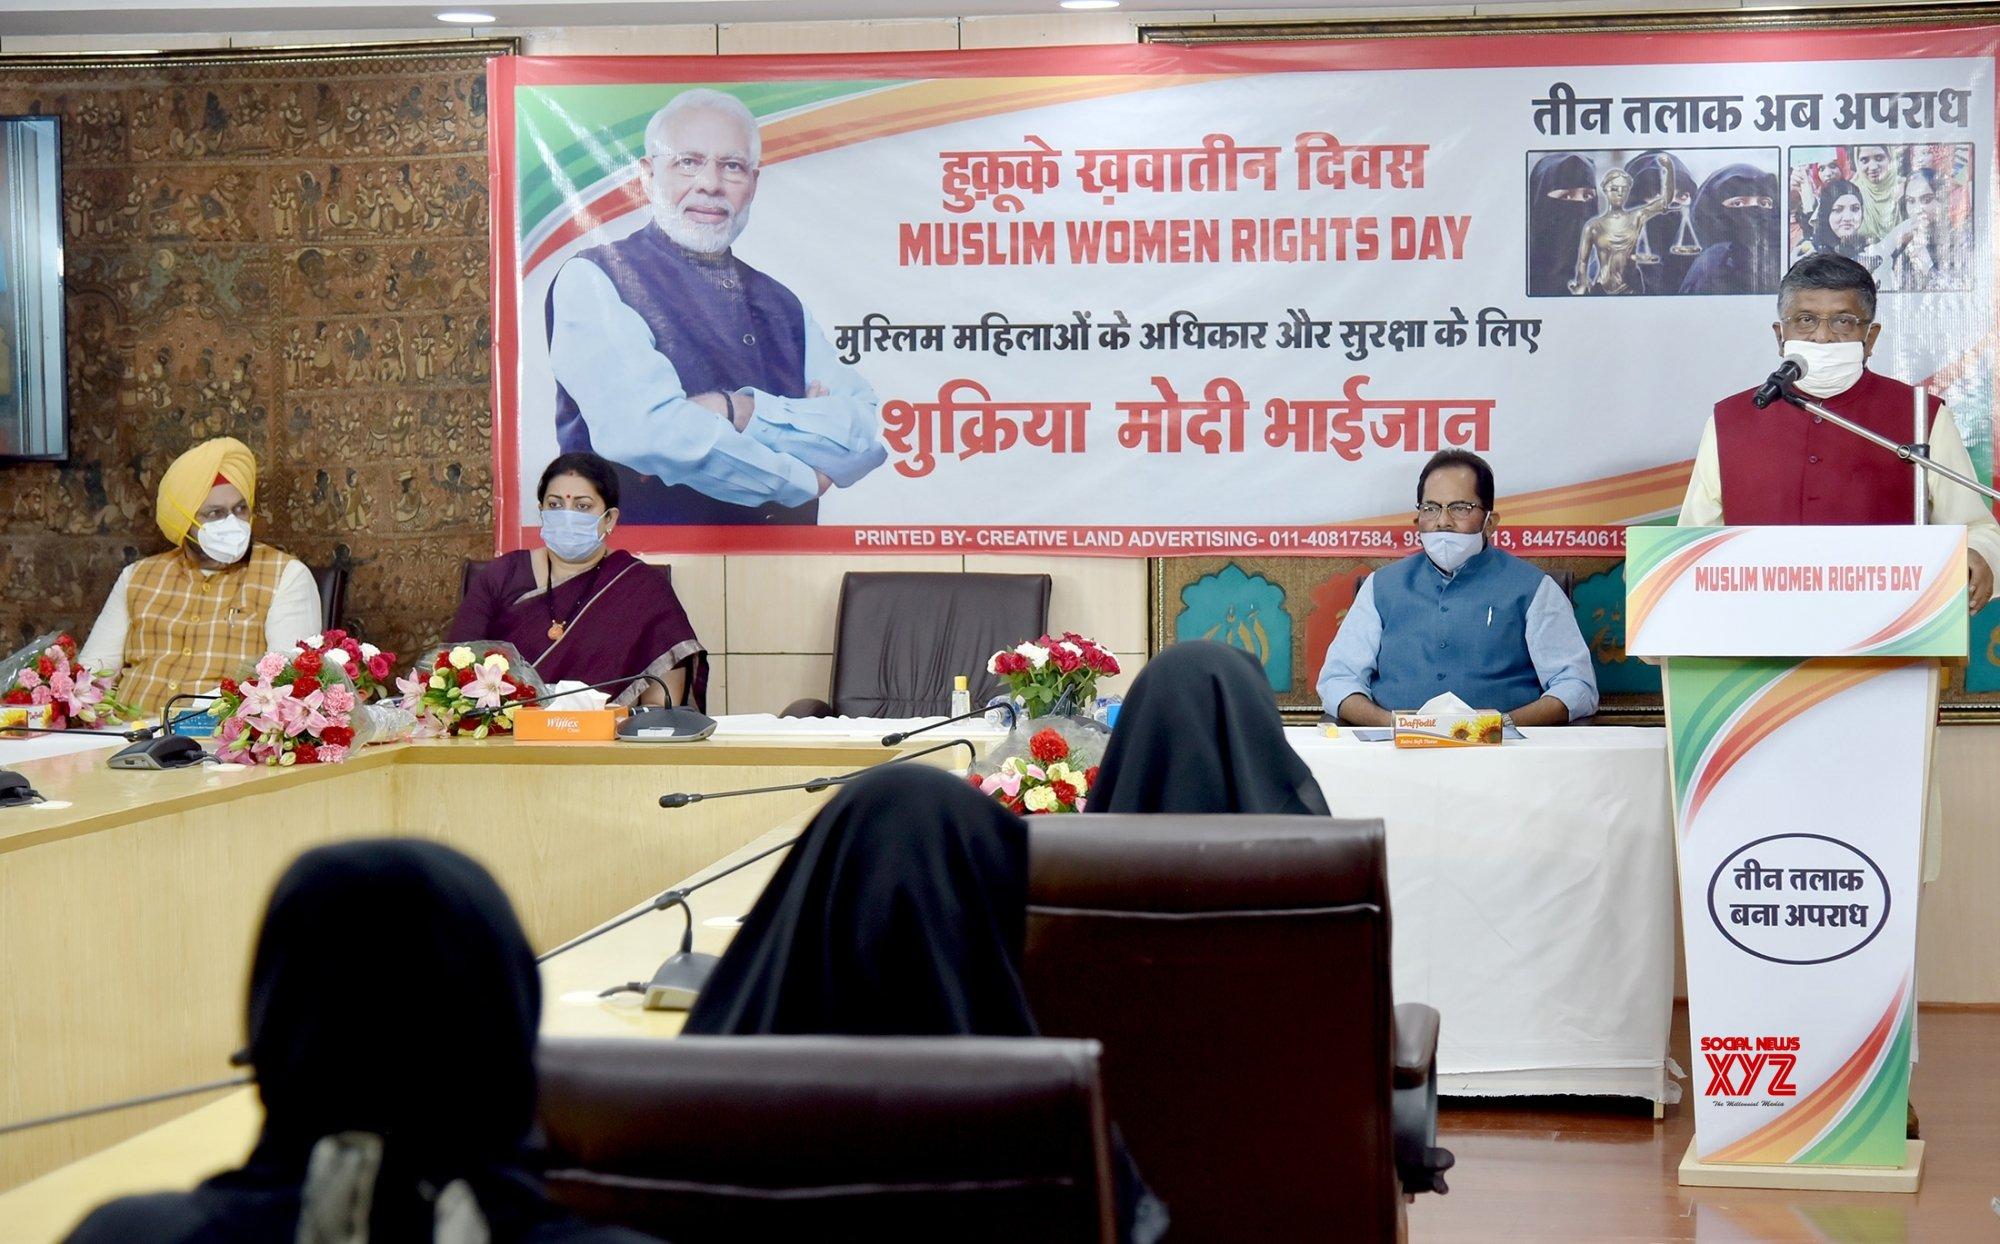 New Delhi: Union Ministers Smriti Irani, Mukhtar Abbas Naqvi, Ravi Shankar Prasad at Muslim Women Rights Day programme #Gallery